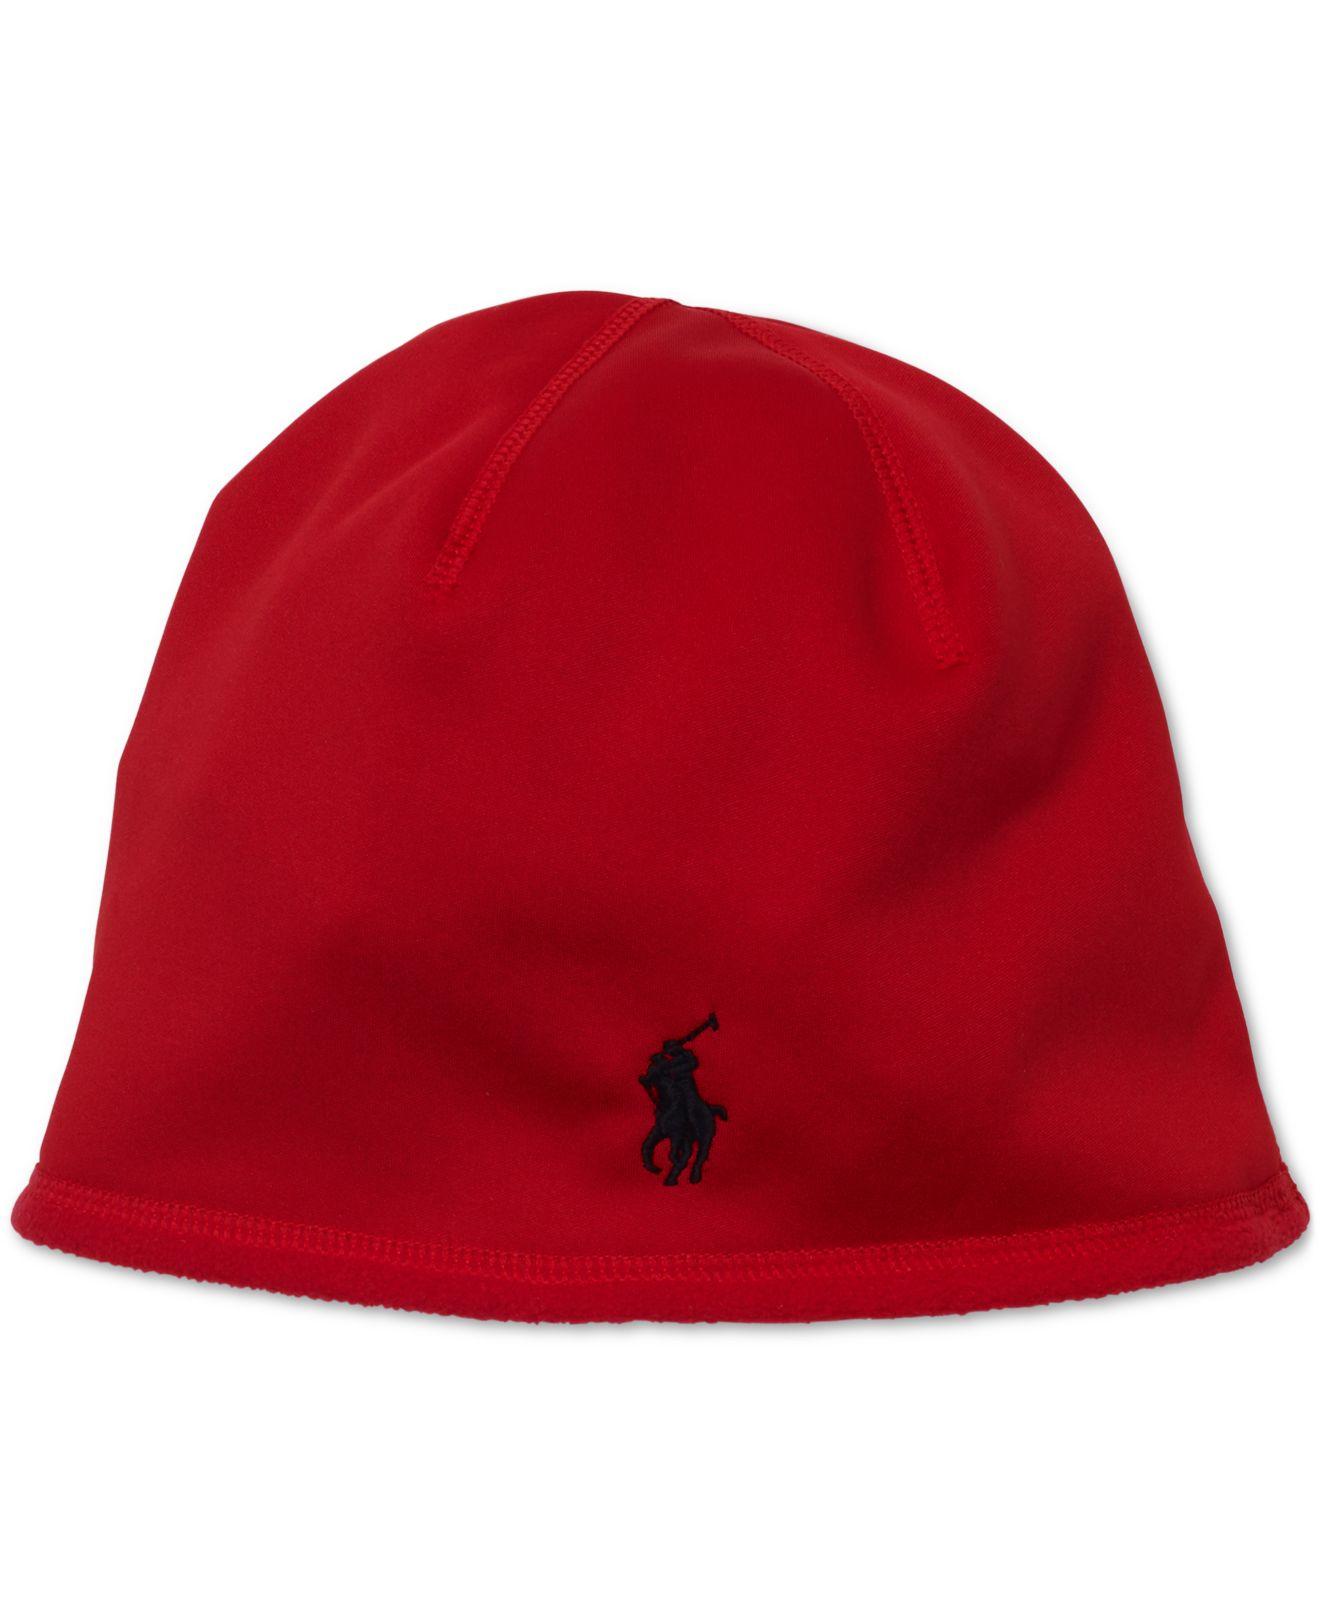 polo ralph lauren bonded skull cap in red for men rl 2000 lyst. Black Bedroom Furniture Sets. Home Design Ideas